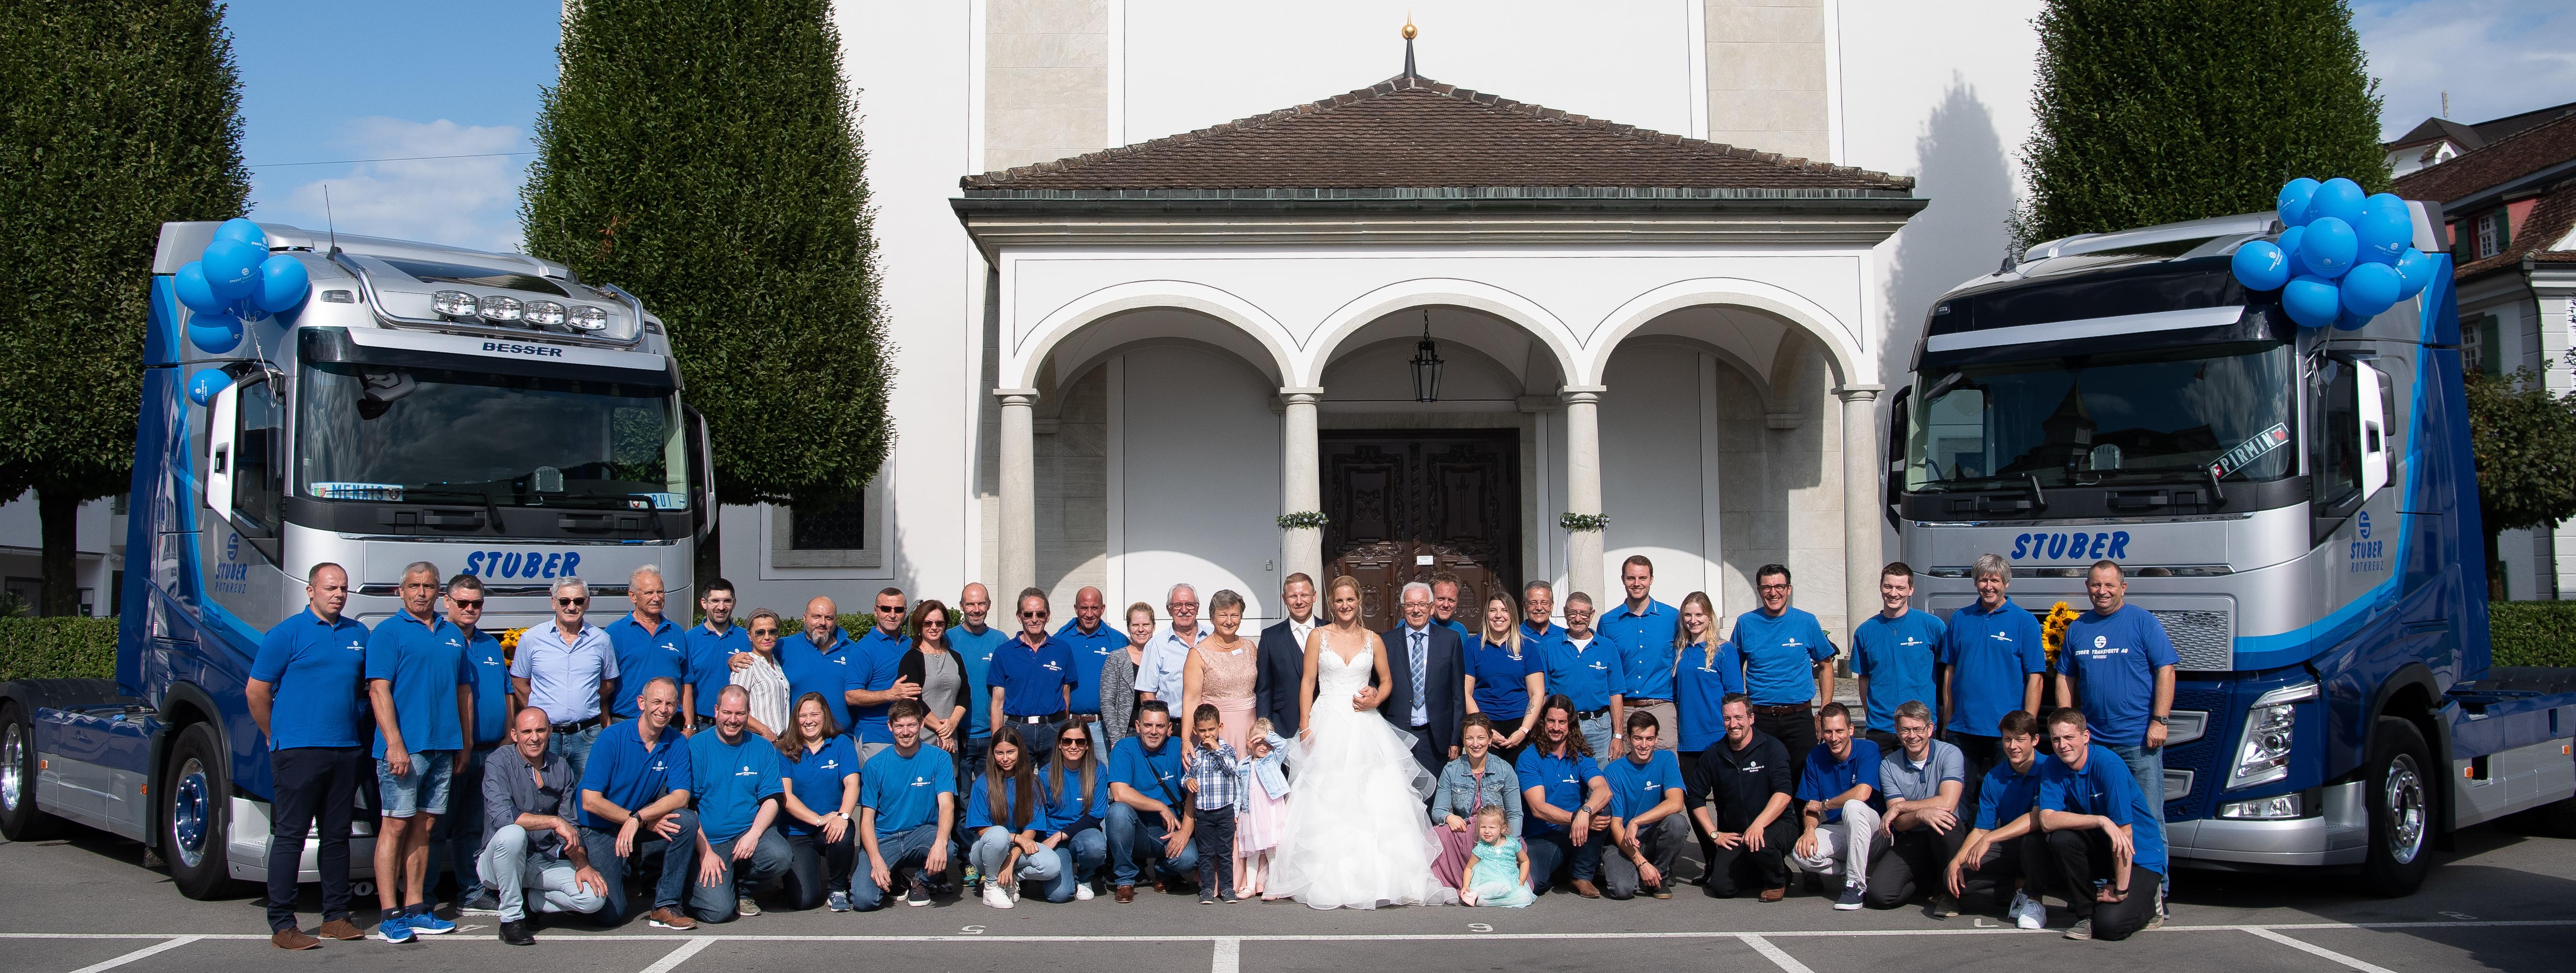 SimoneMario_Hochzeit_Volvo_Stuber_Transporte